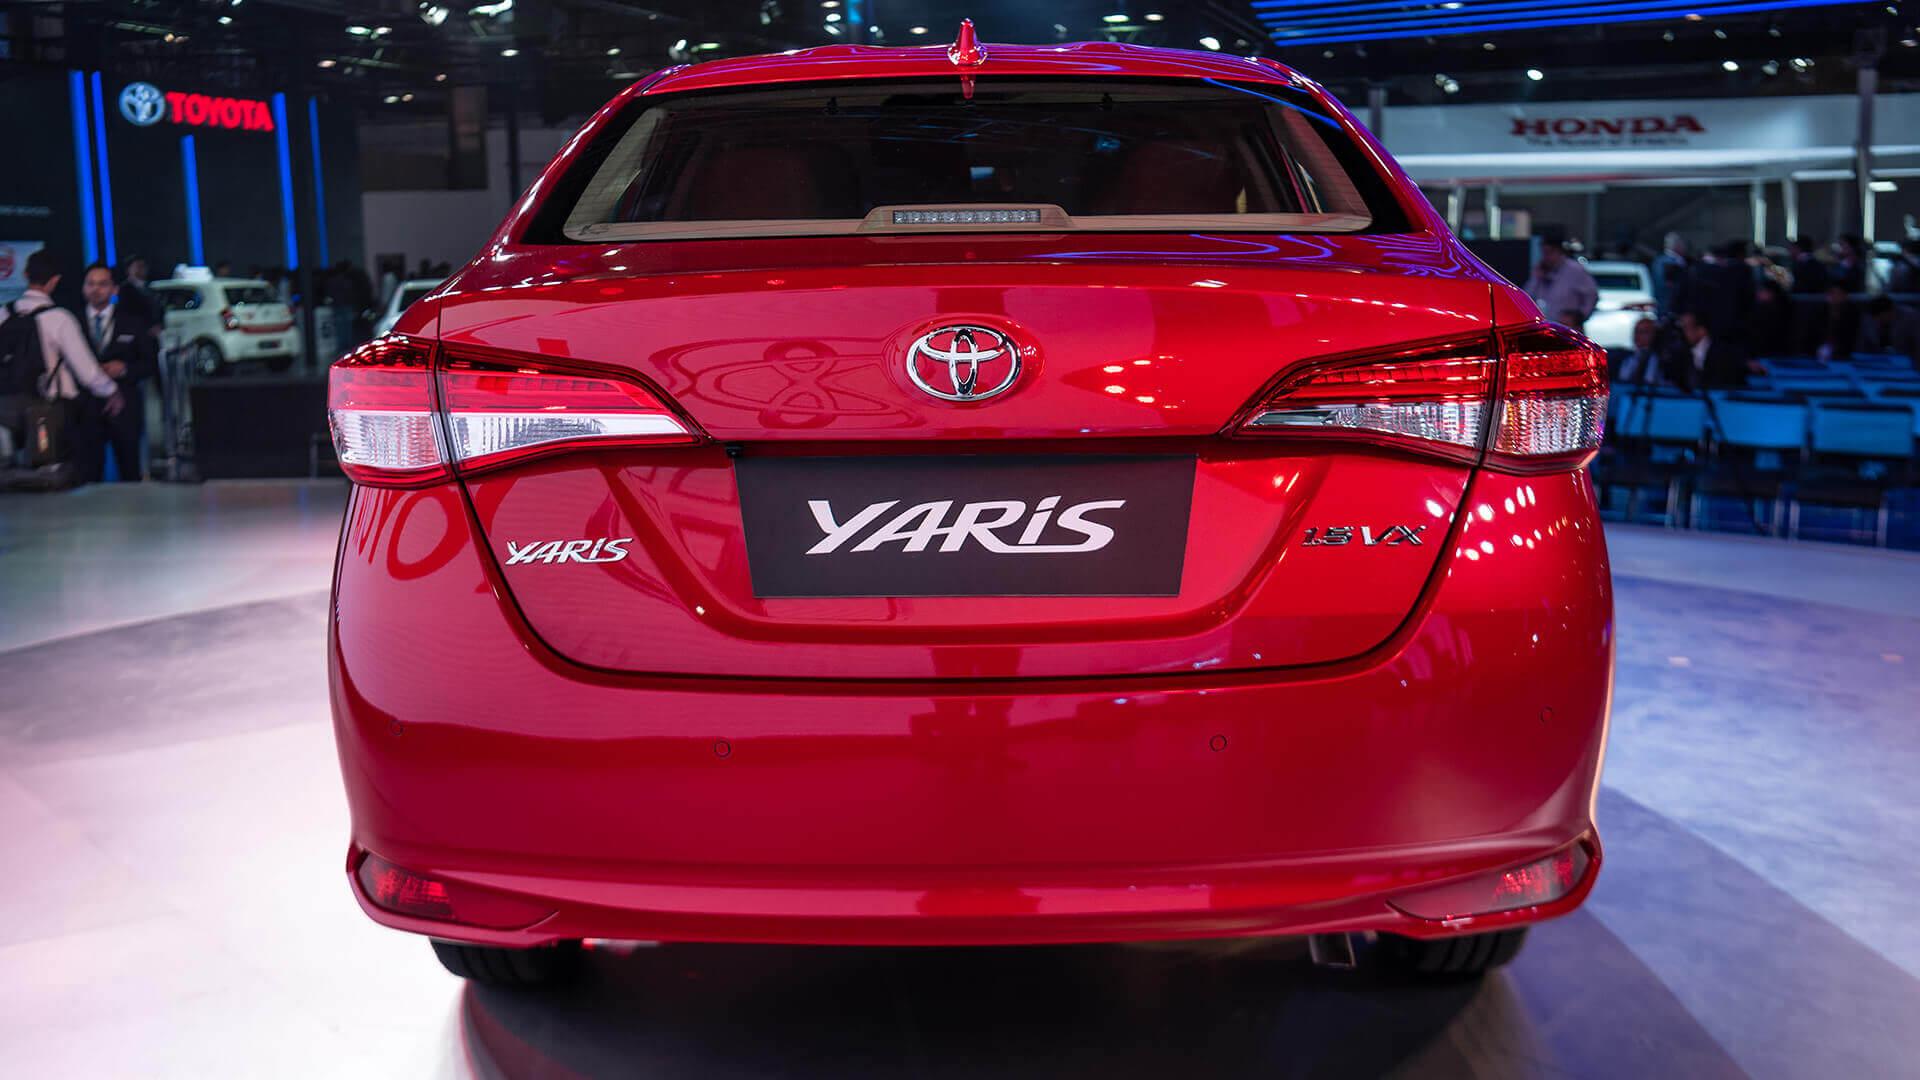 Toyota-Yaris-India-Auto-Expo-2018_4